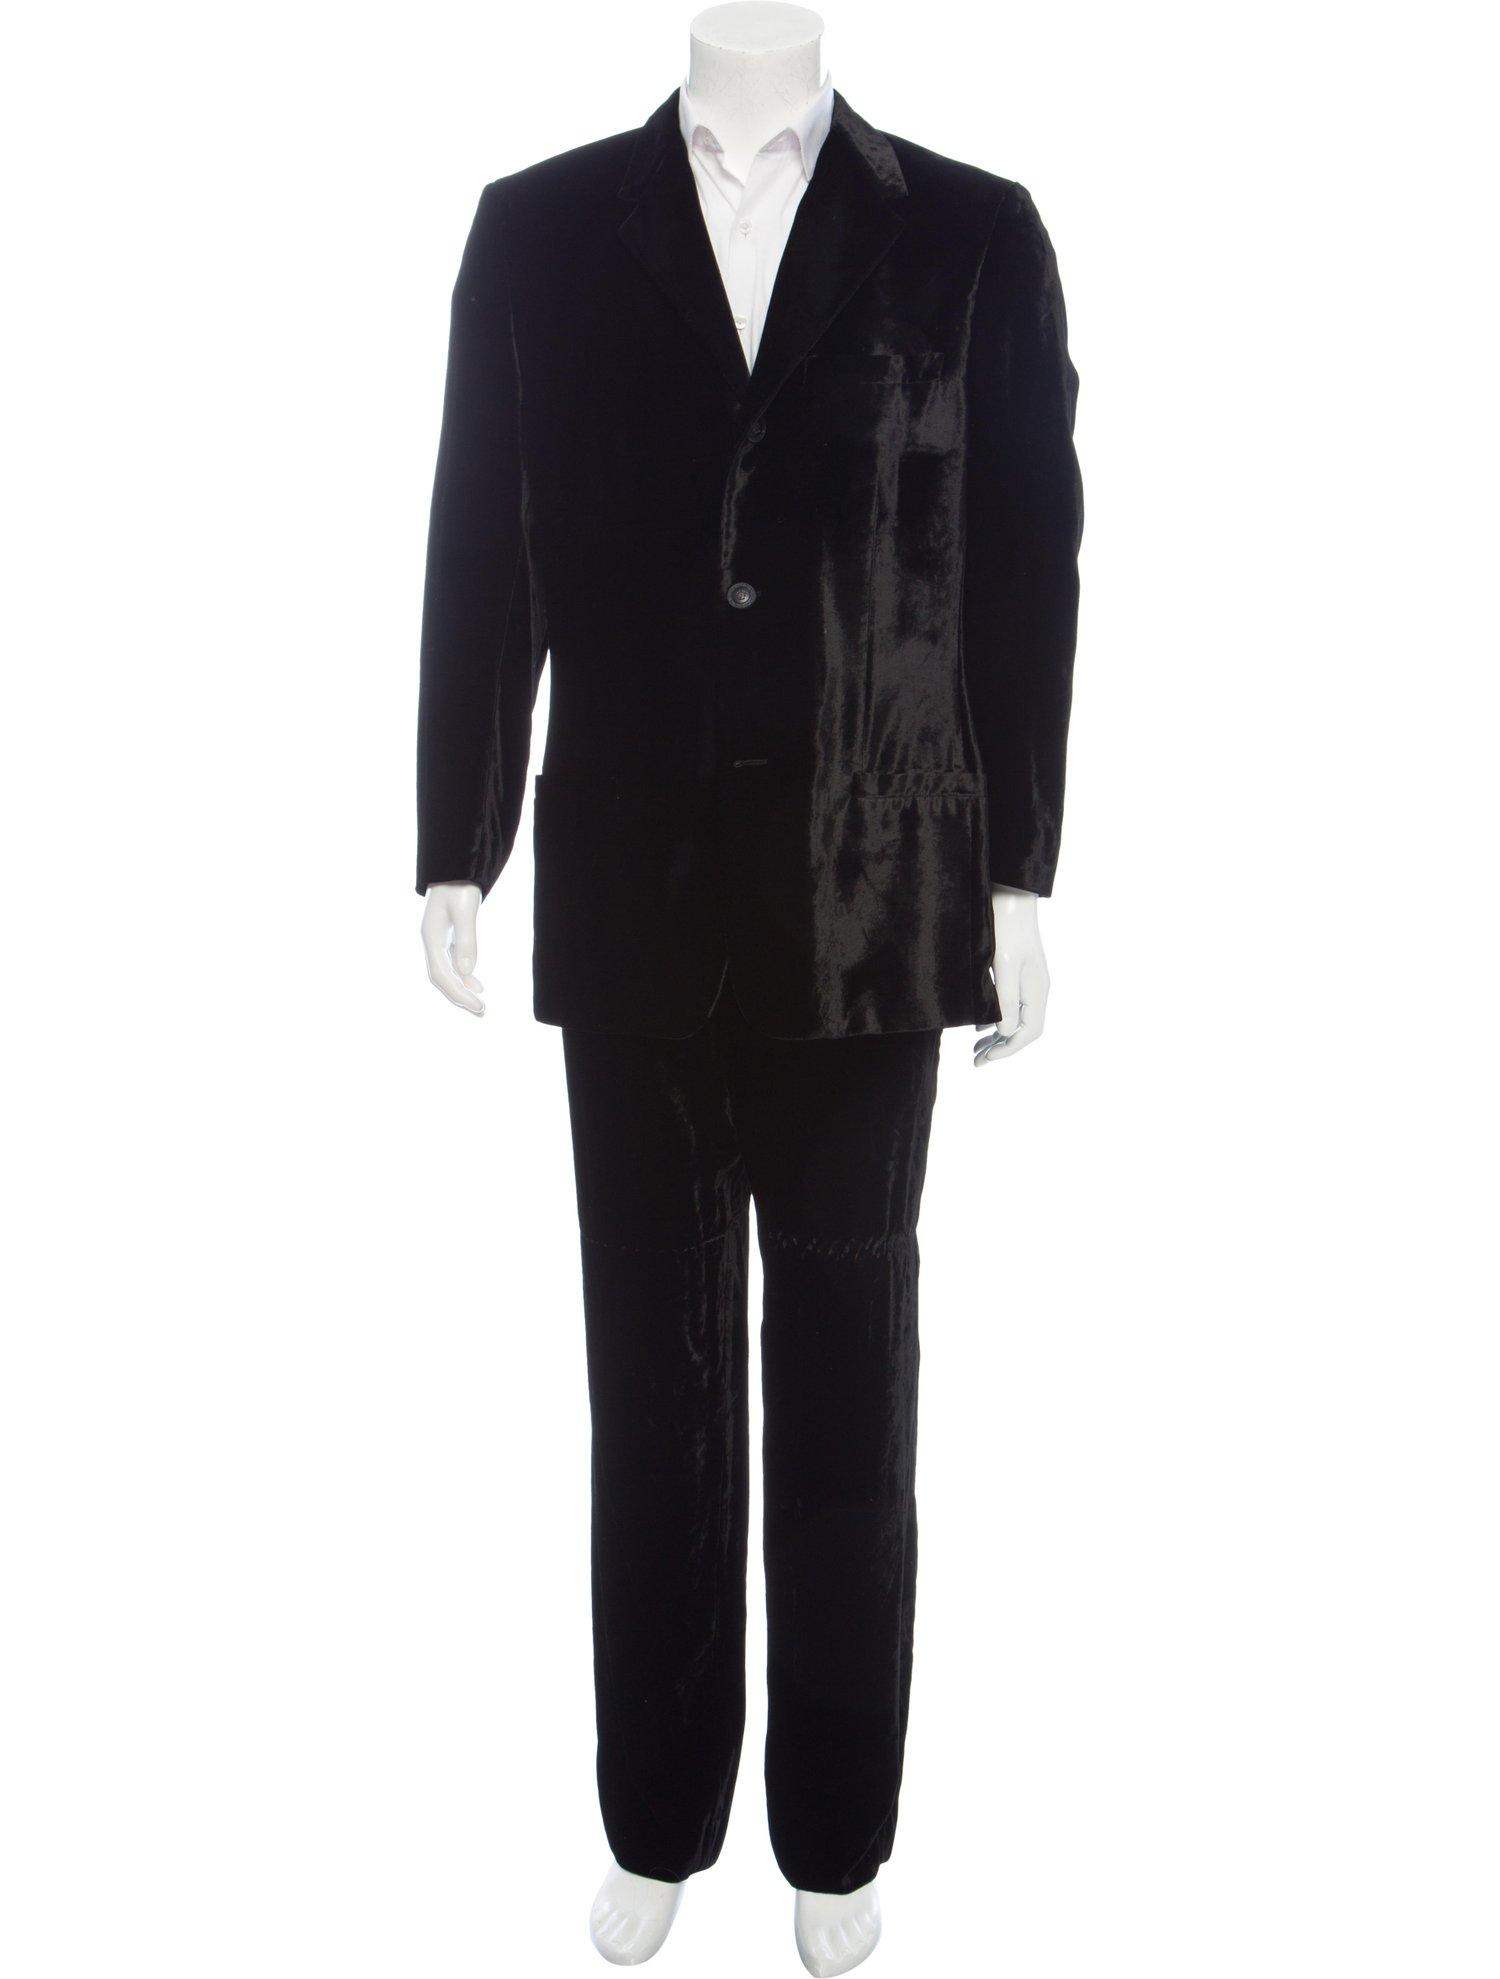 Vintage Versace Velvet Men's Two-Piece Suit, $472 @therealreal.com